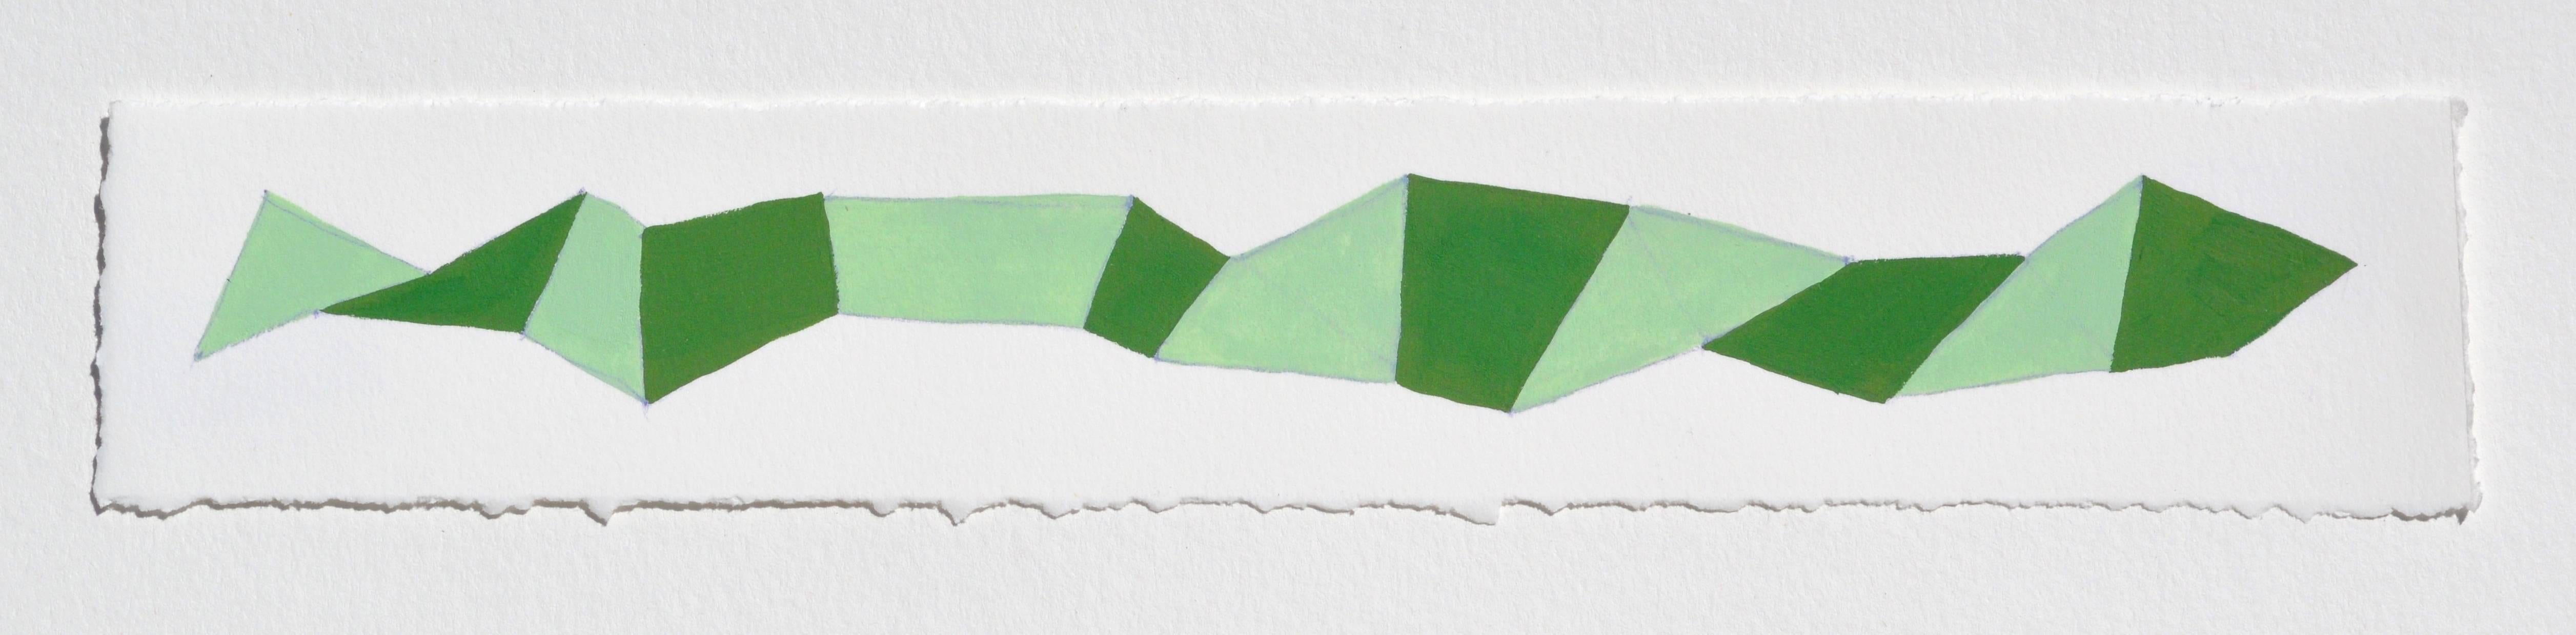 Karen Schiff, Word Snake G, 2014, Watercolor, Gouache, Rag Paper, Pencil